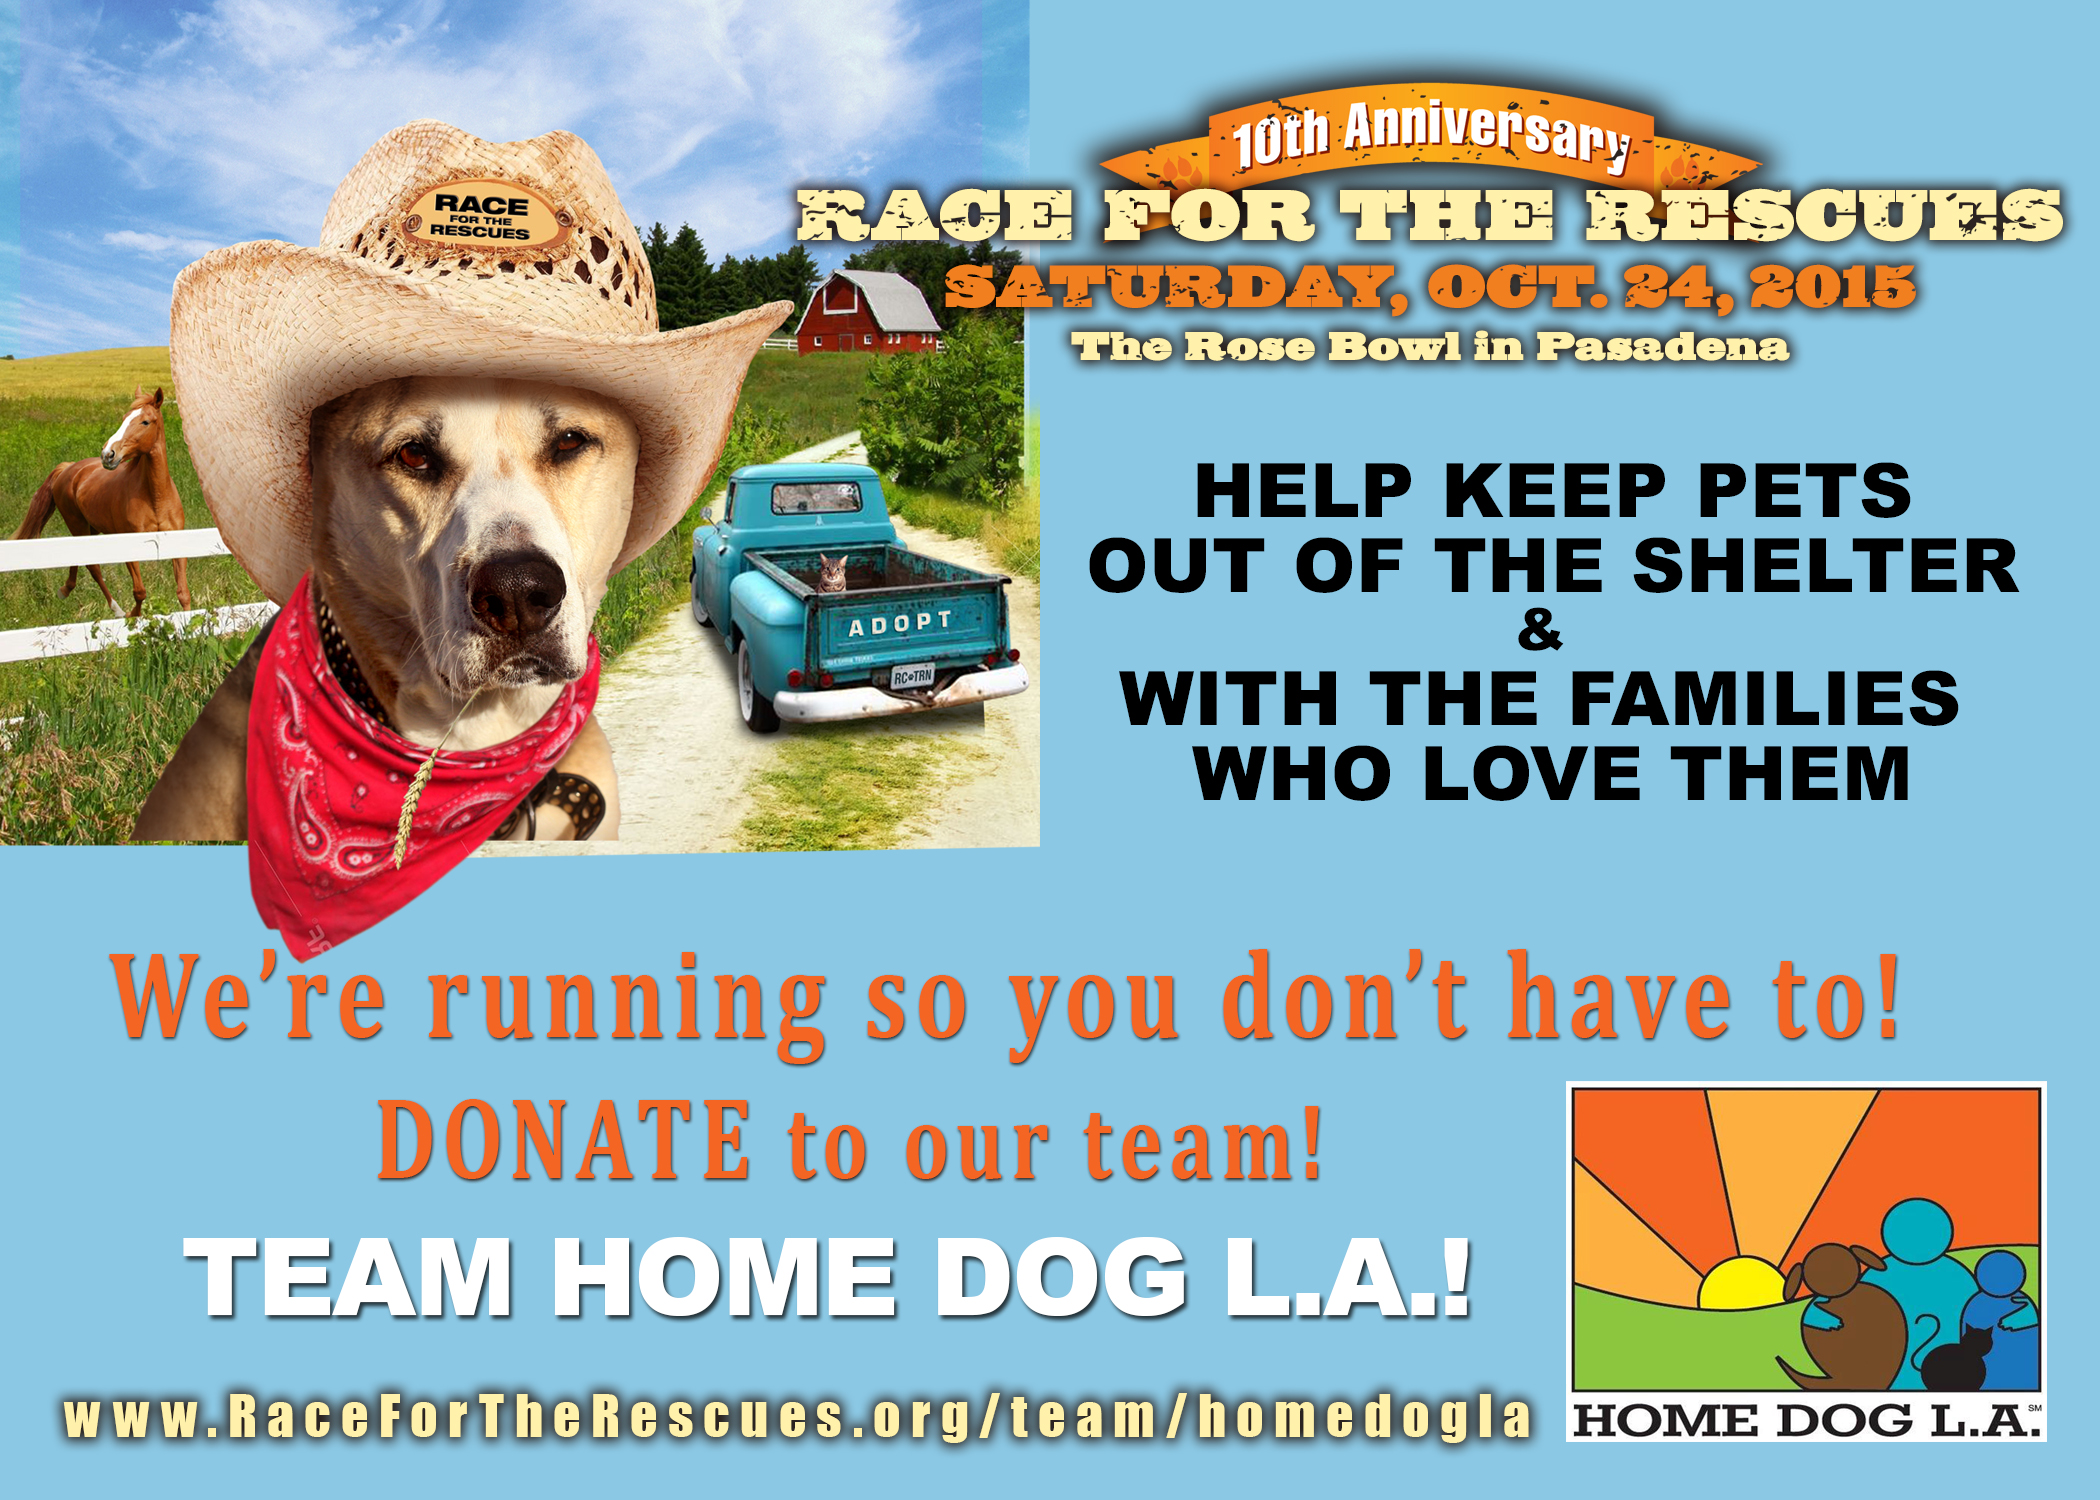 http://racefortherescues.org/team/homedogla